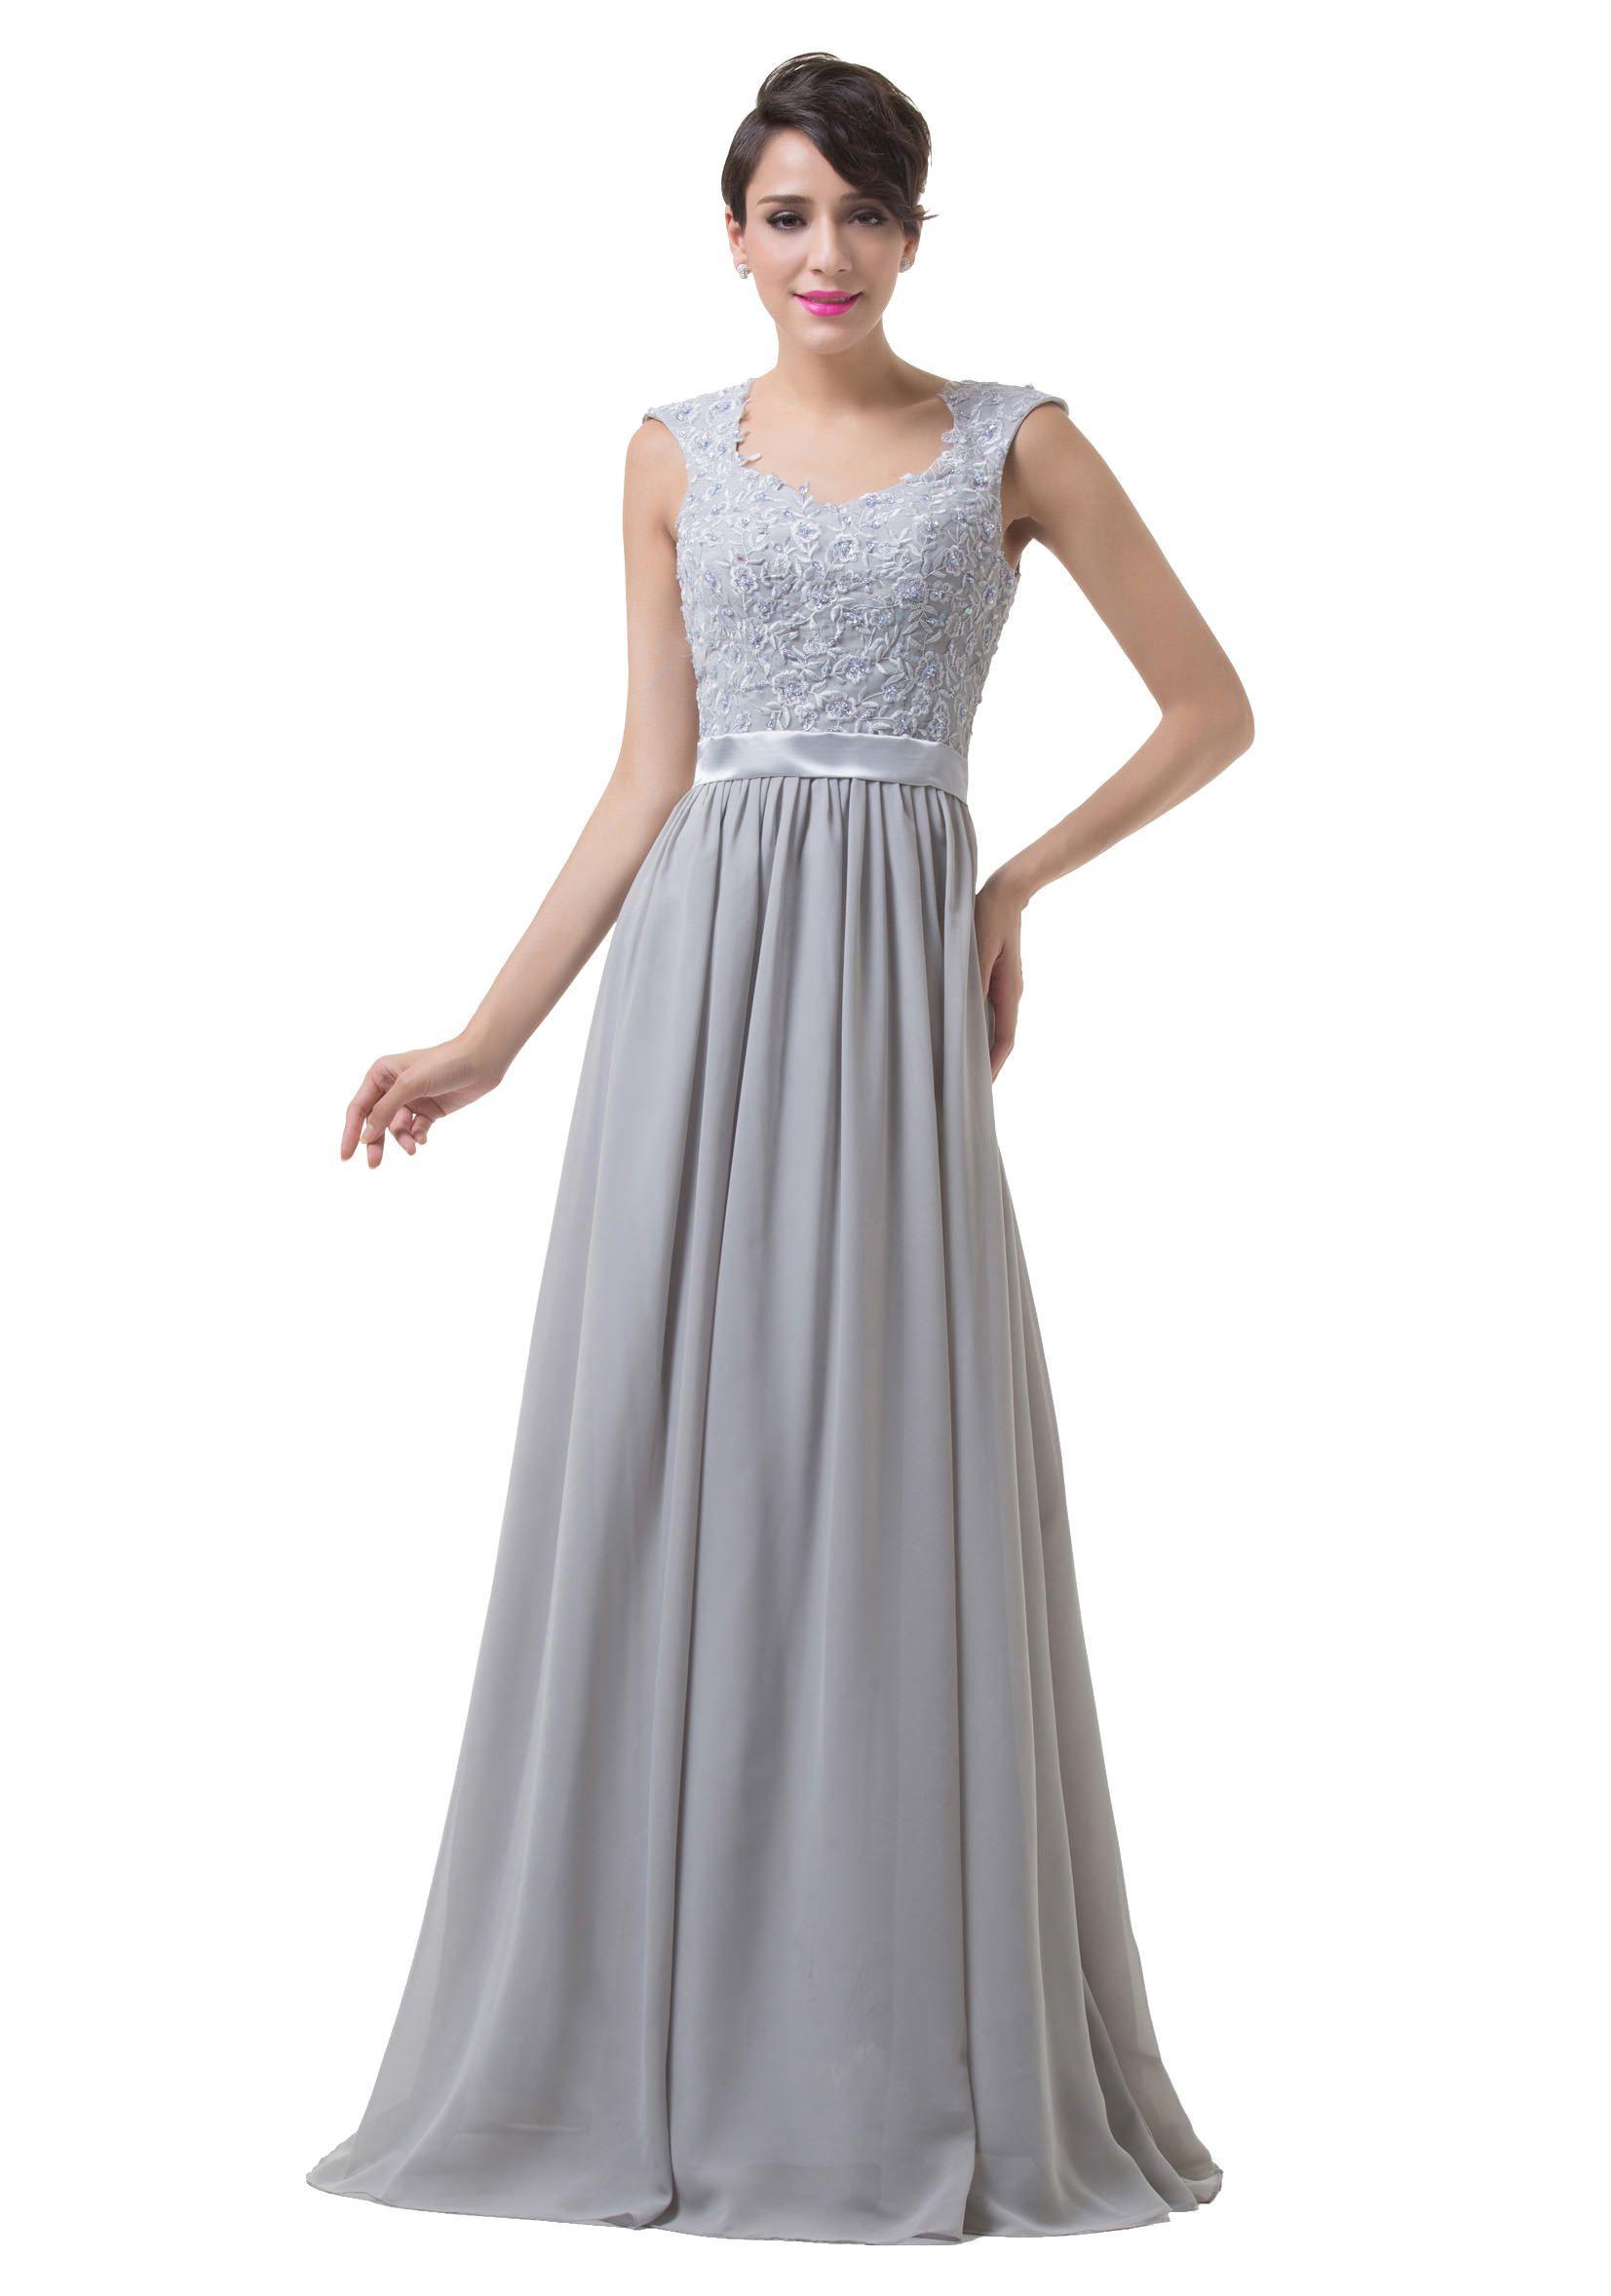 15 Luxurius Bodenlanges Abendkleid Bester Preis10 Schön Bodenlanges Abendkleid Bester Preis